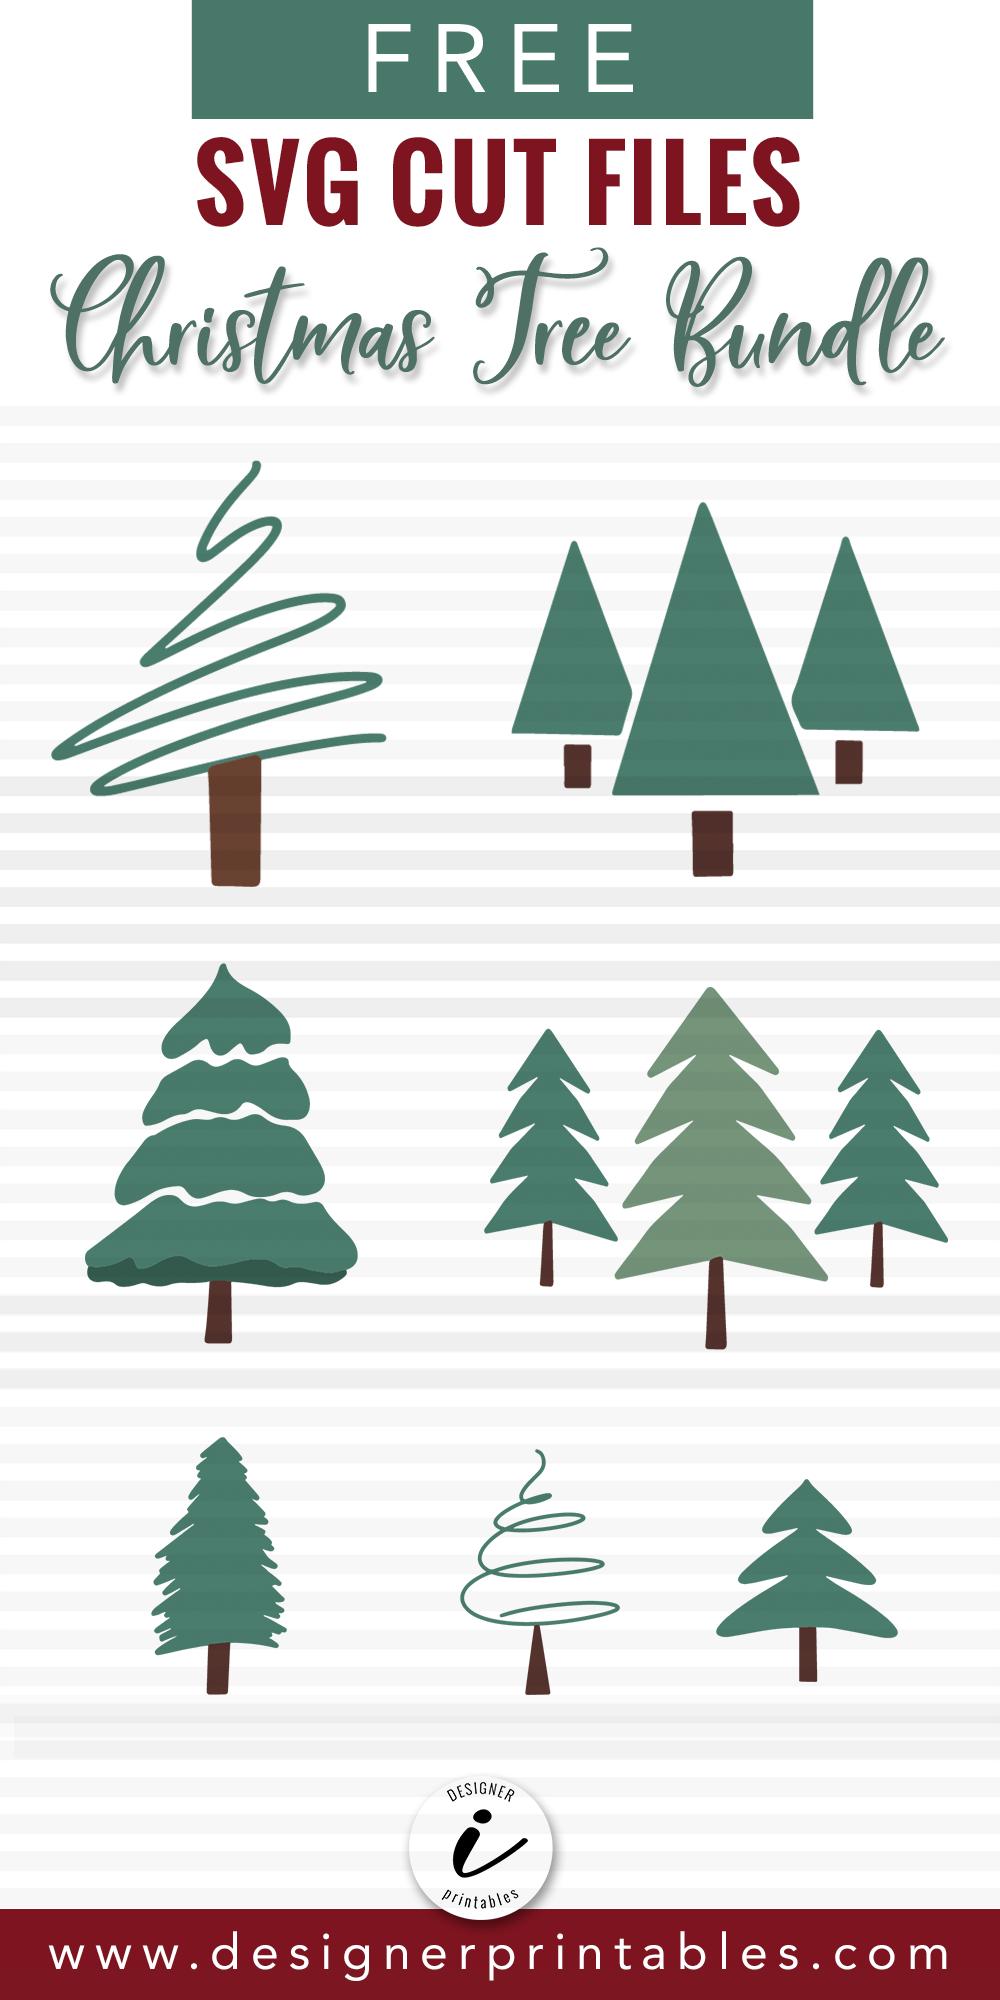 Free Christmas Tree Svg Christmas Tree Bundle Designer Printables Christmas Svg Files Free Tree Svg Christmas Svg Files